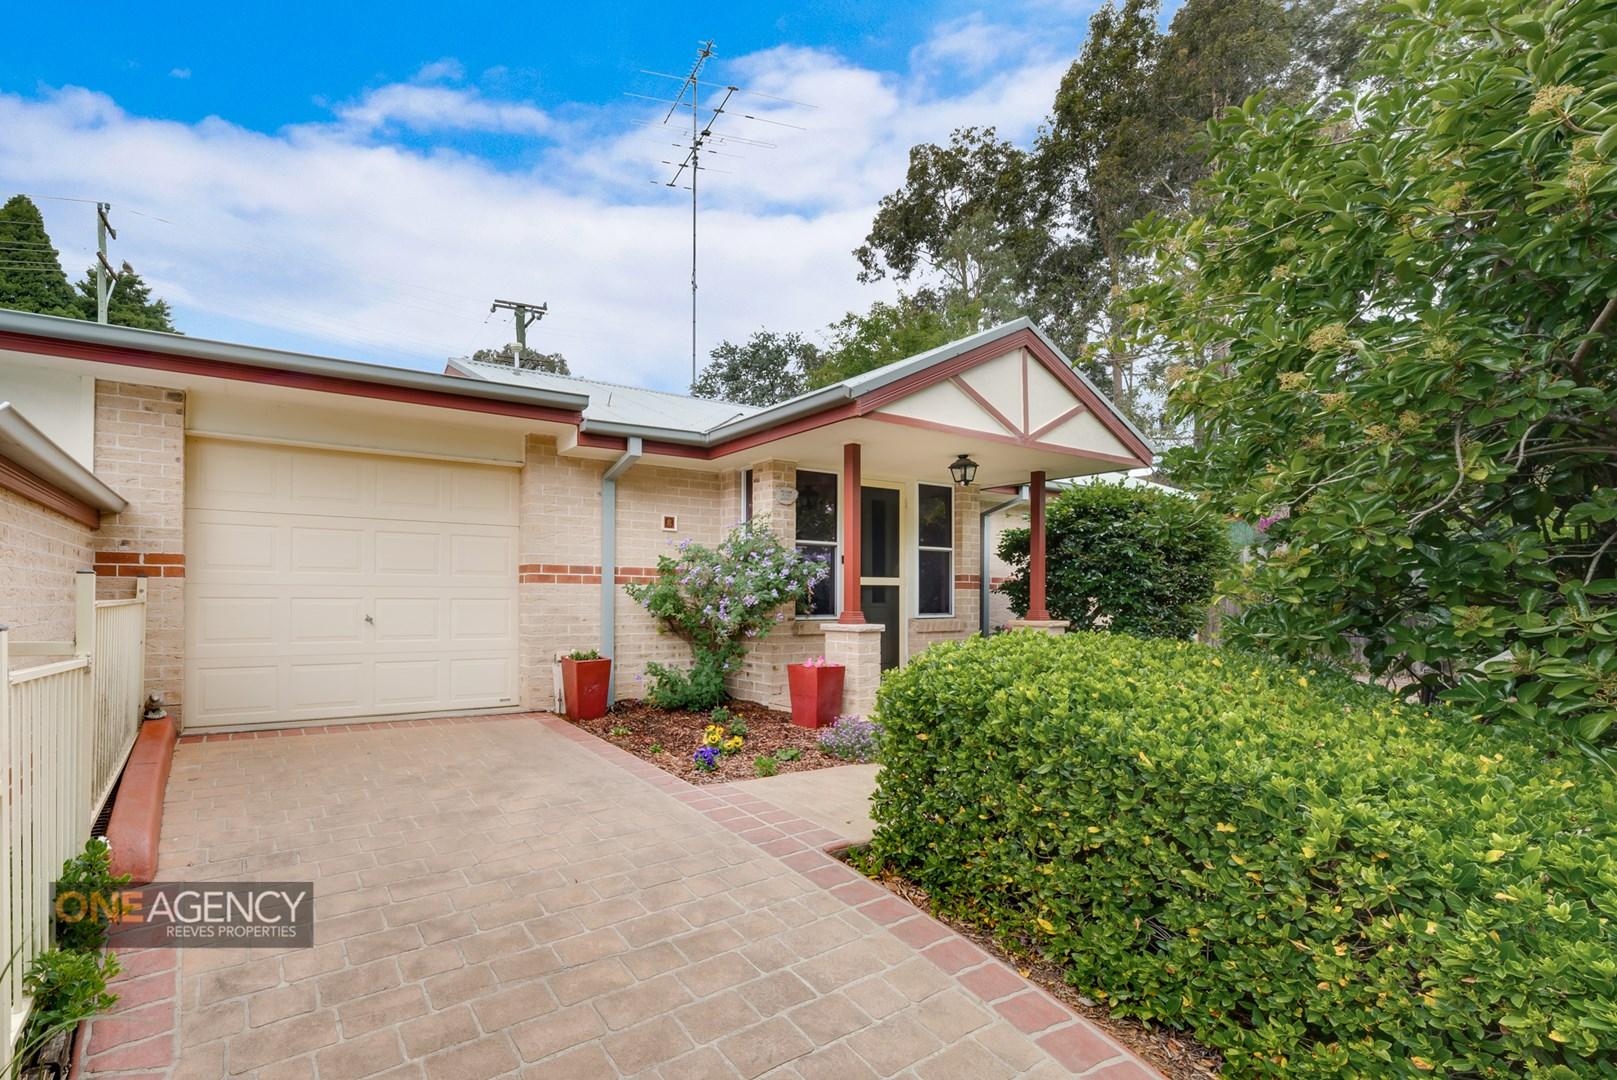 8/1-5 Bland  Road, Springwood NSW 2777, Image 0